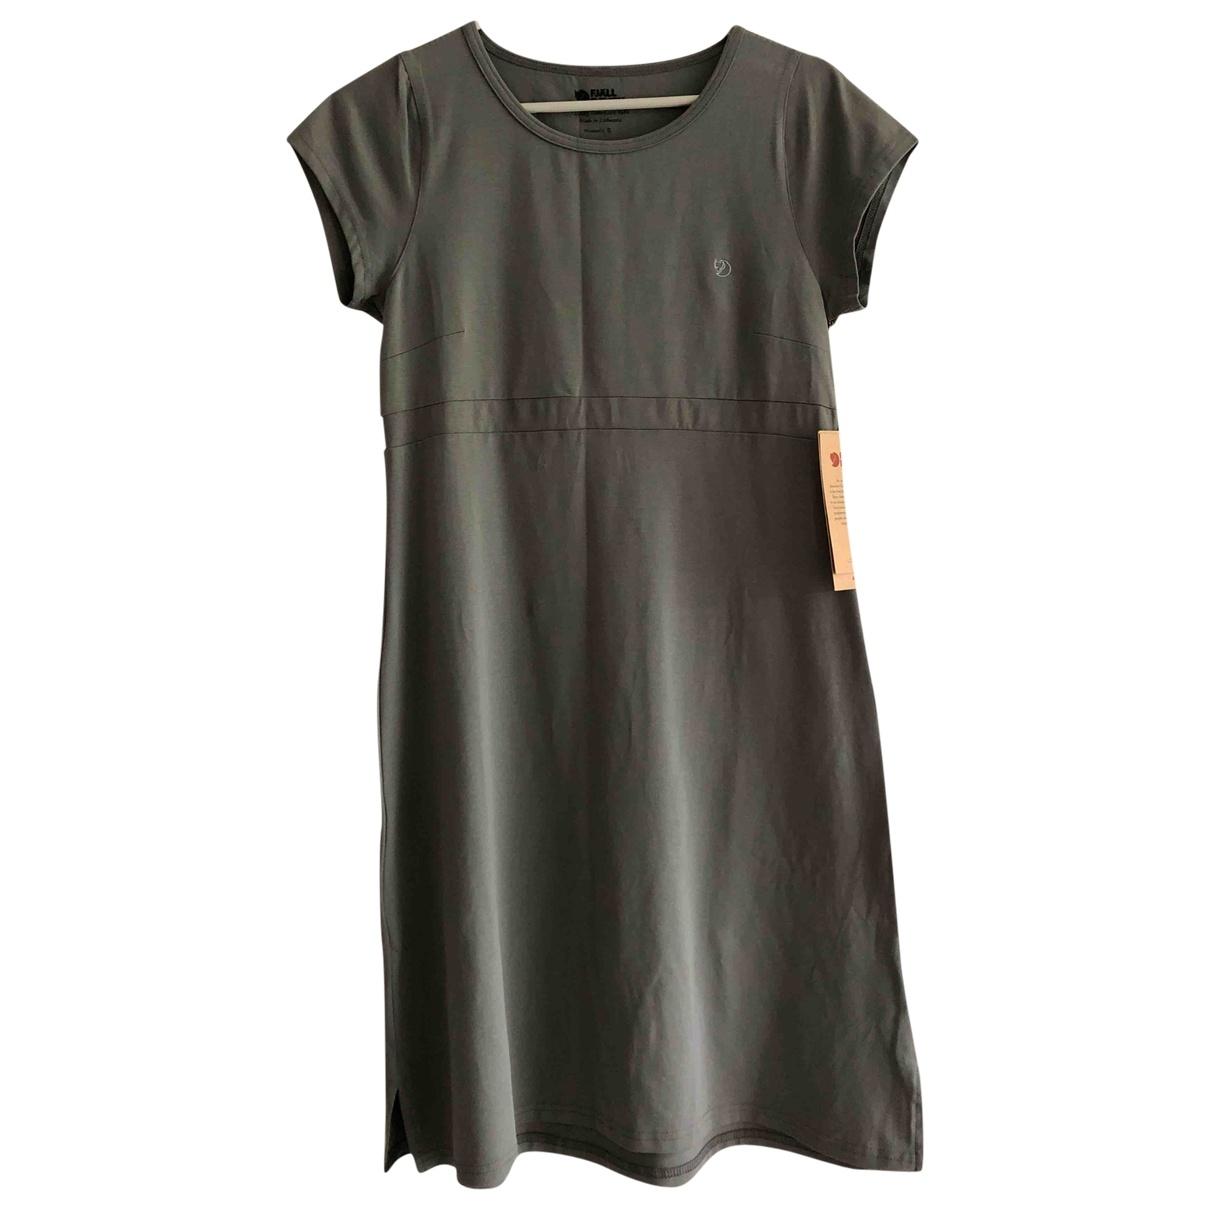 Fjallräven \N Grey Cotton dress for Women S International